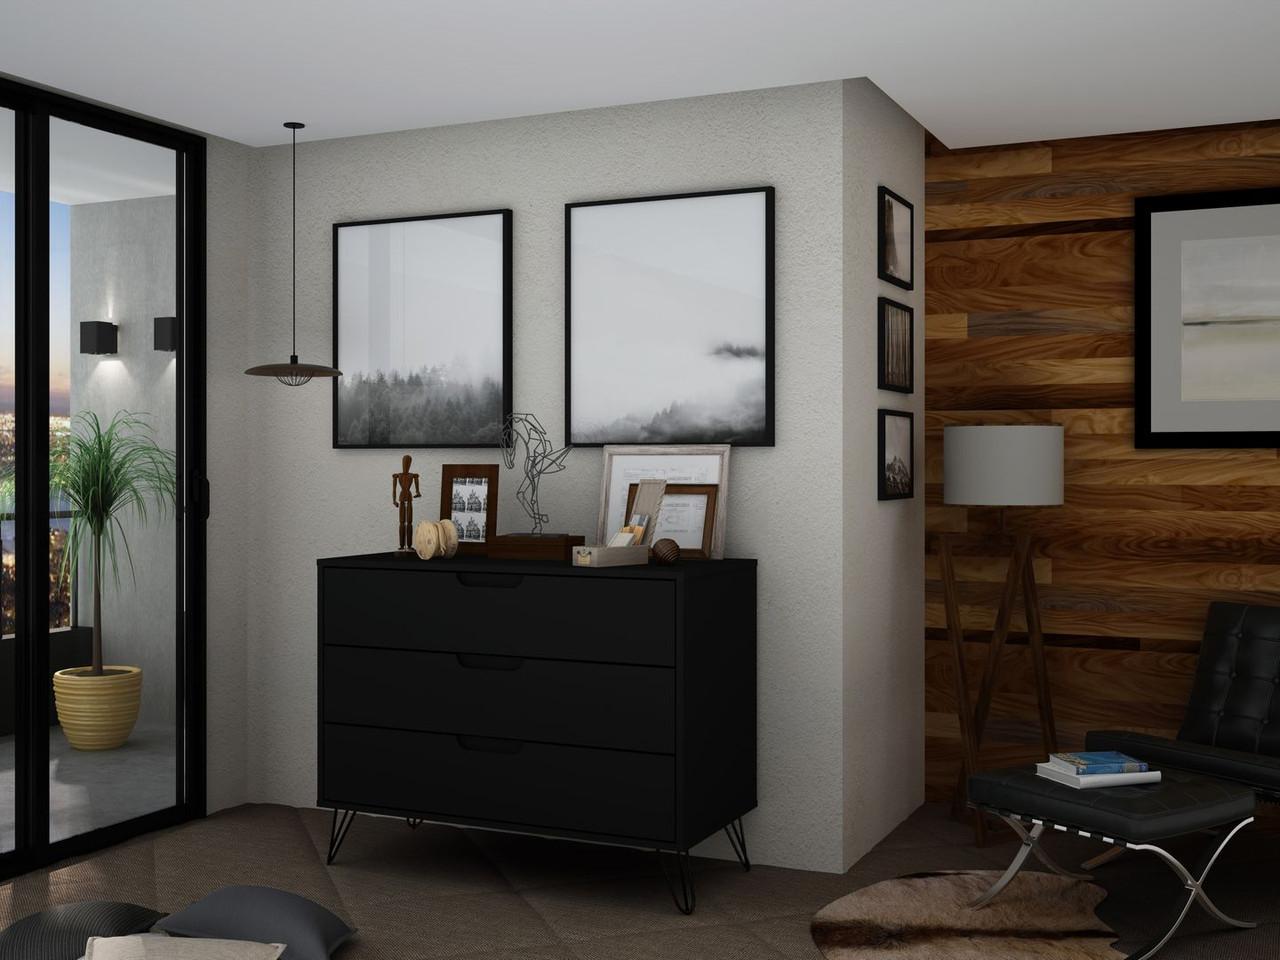 Image of: Manhattan Comfort Rockefeller Mid Century Modern Dresser With 3 Drawers In Black Furniture East Inc